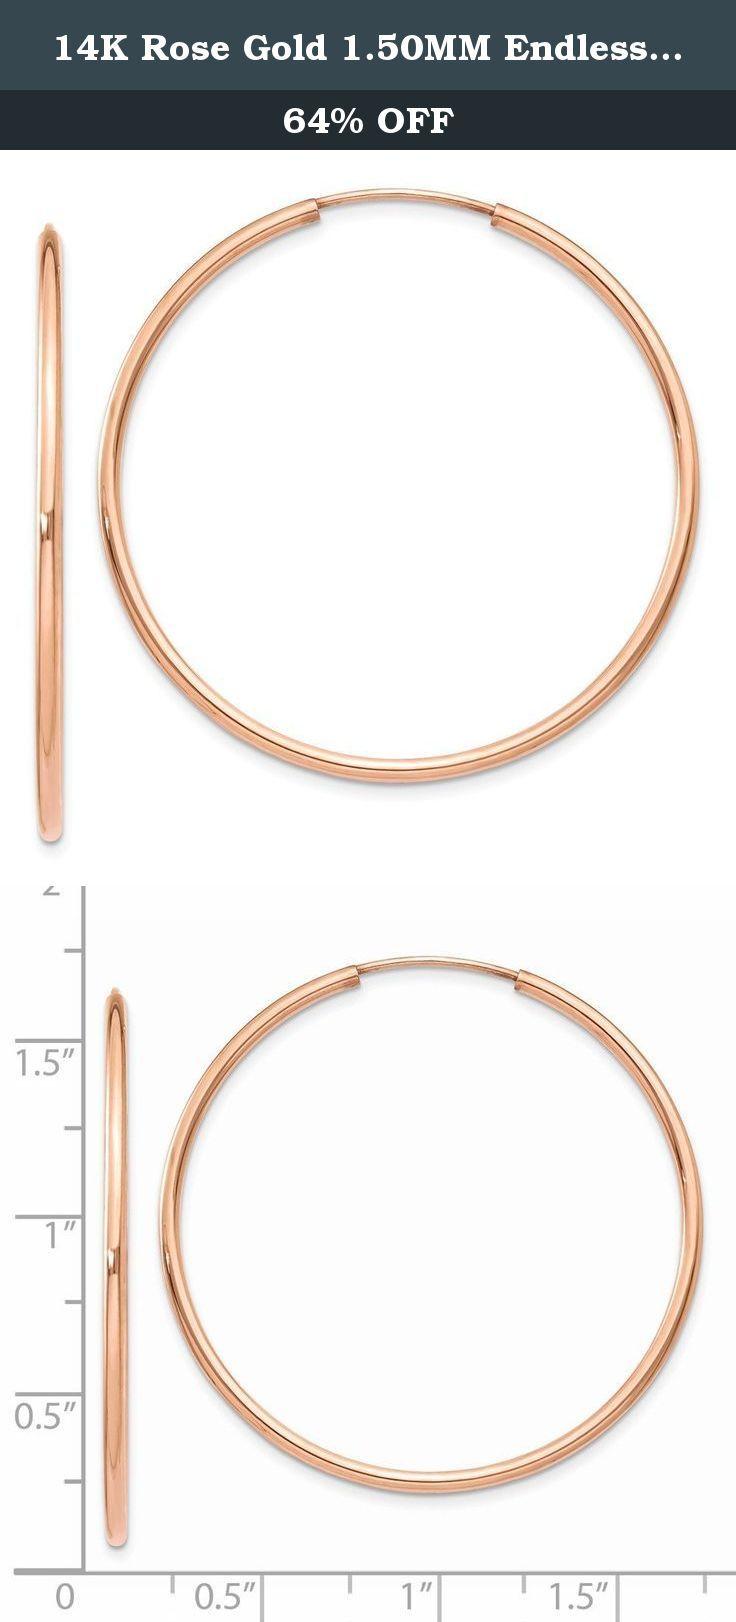 14K Rose Gold 150MM Endless Round Tube Hoop Earrings Caring For